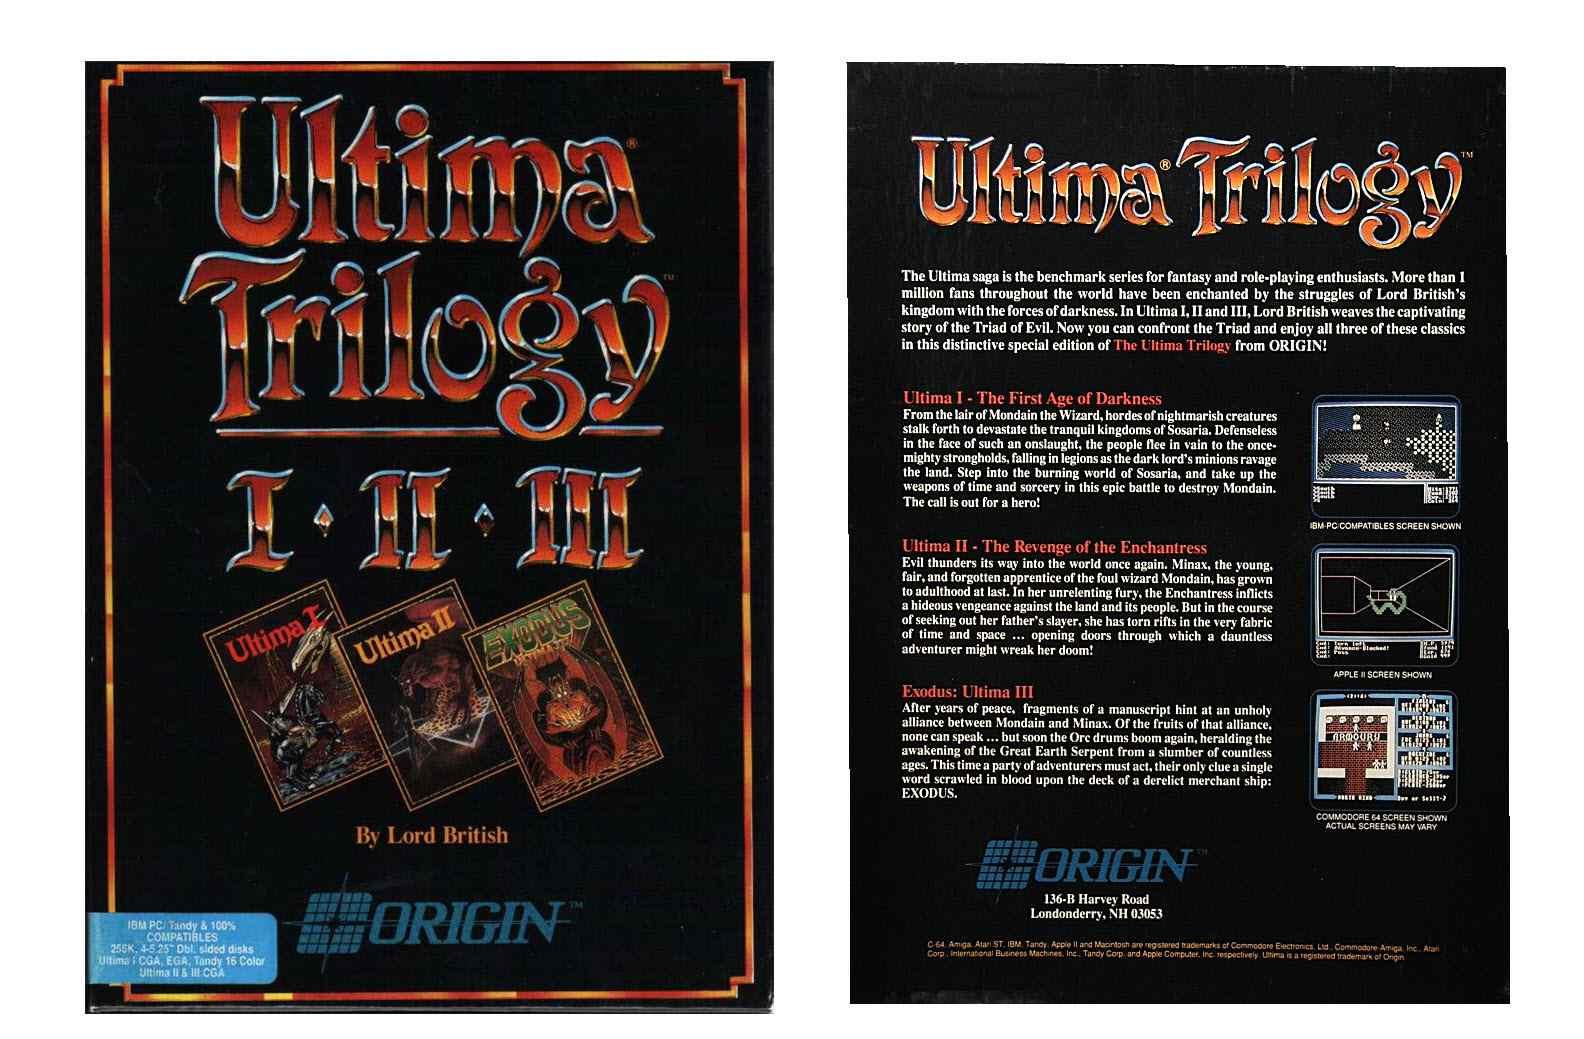 Ultima Trilogy Box Art